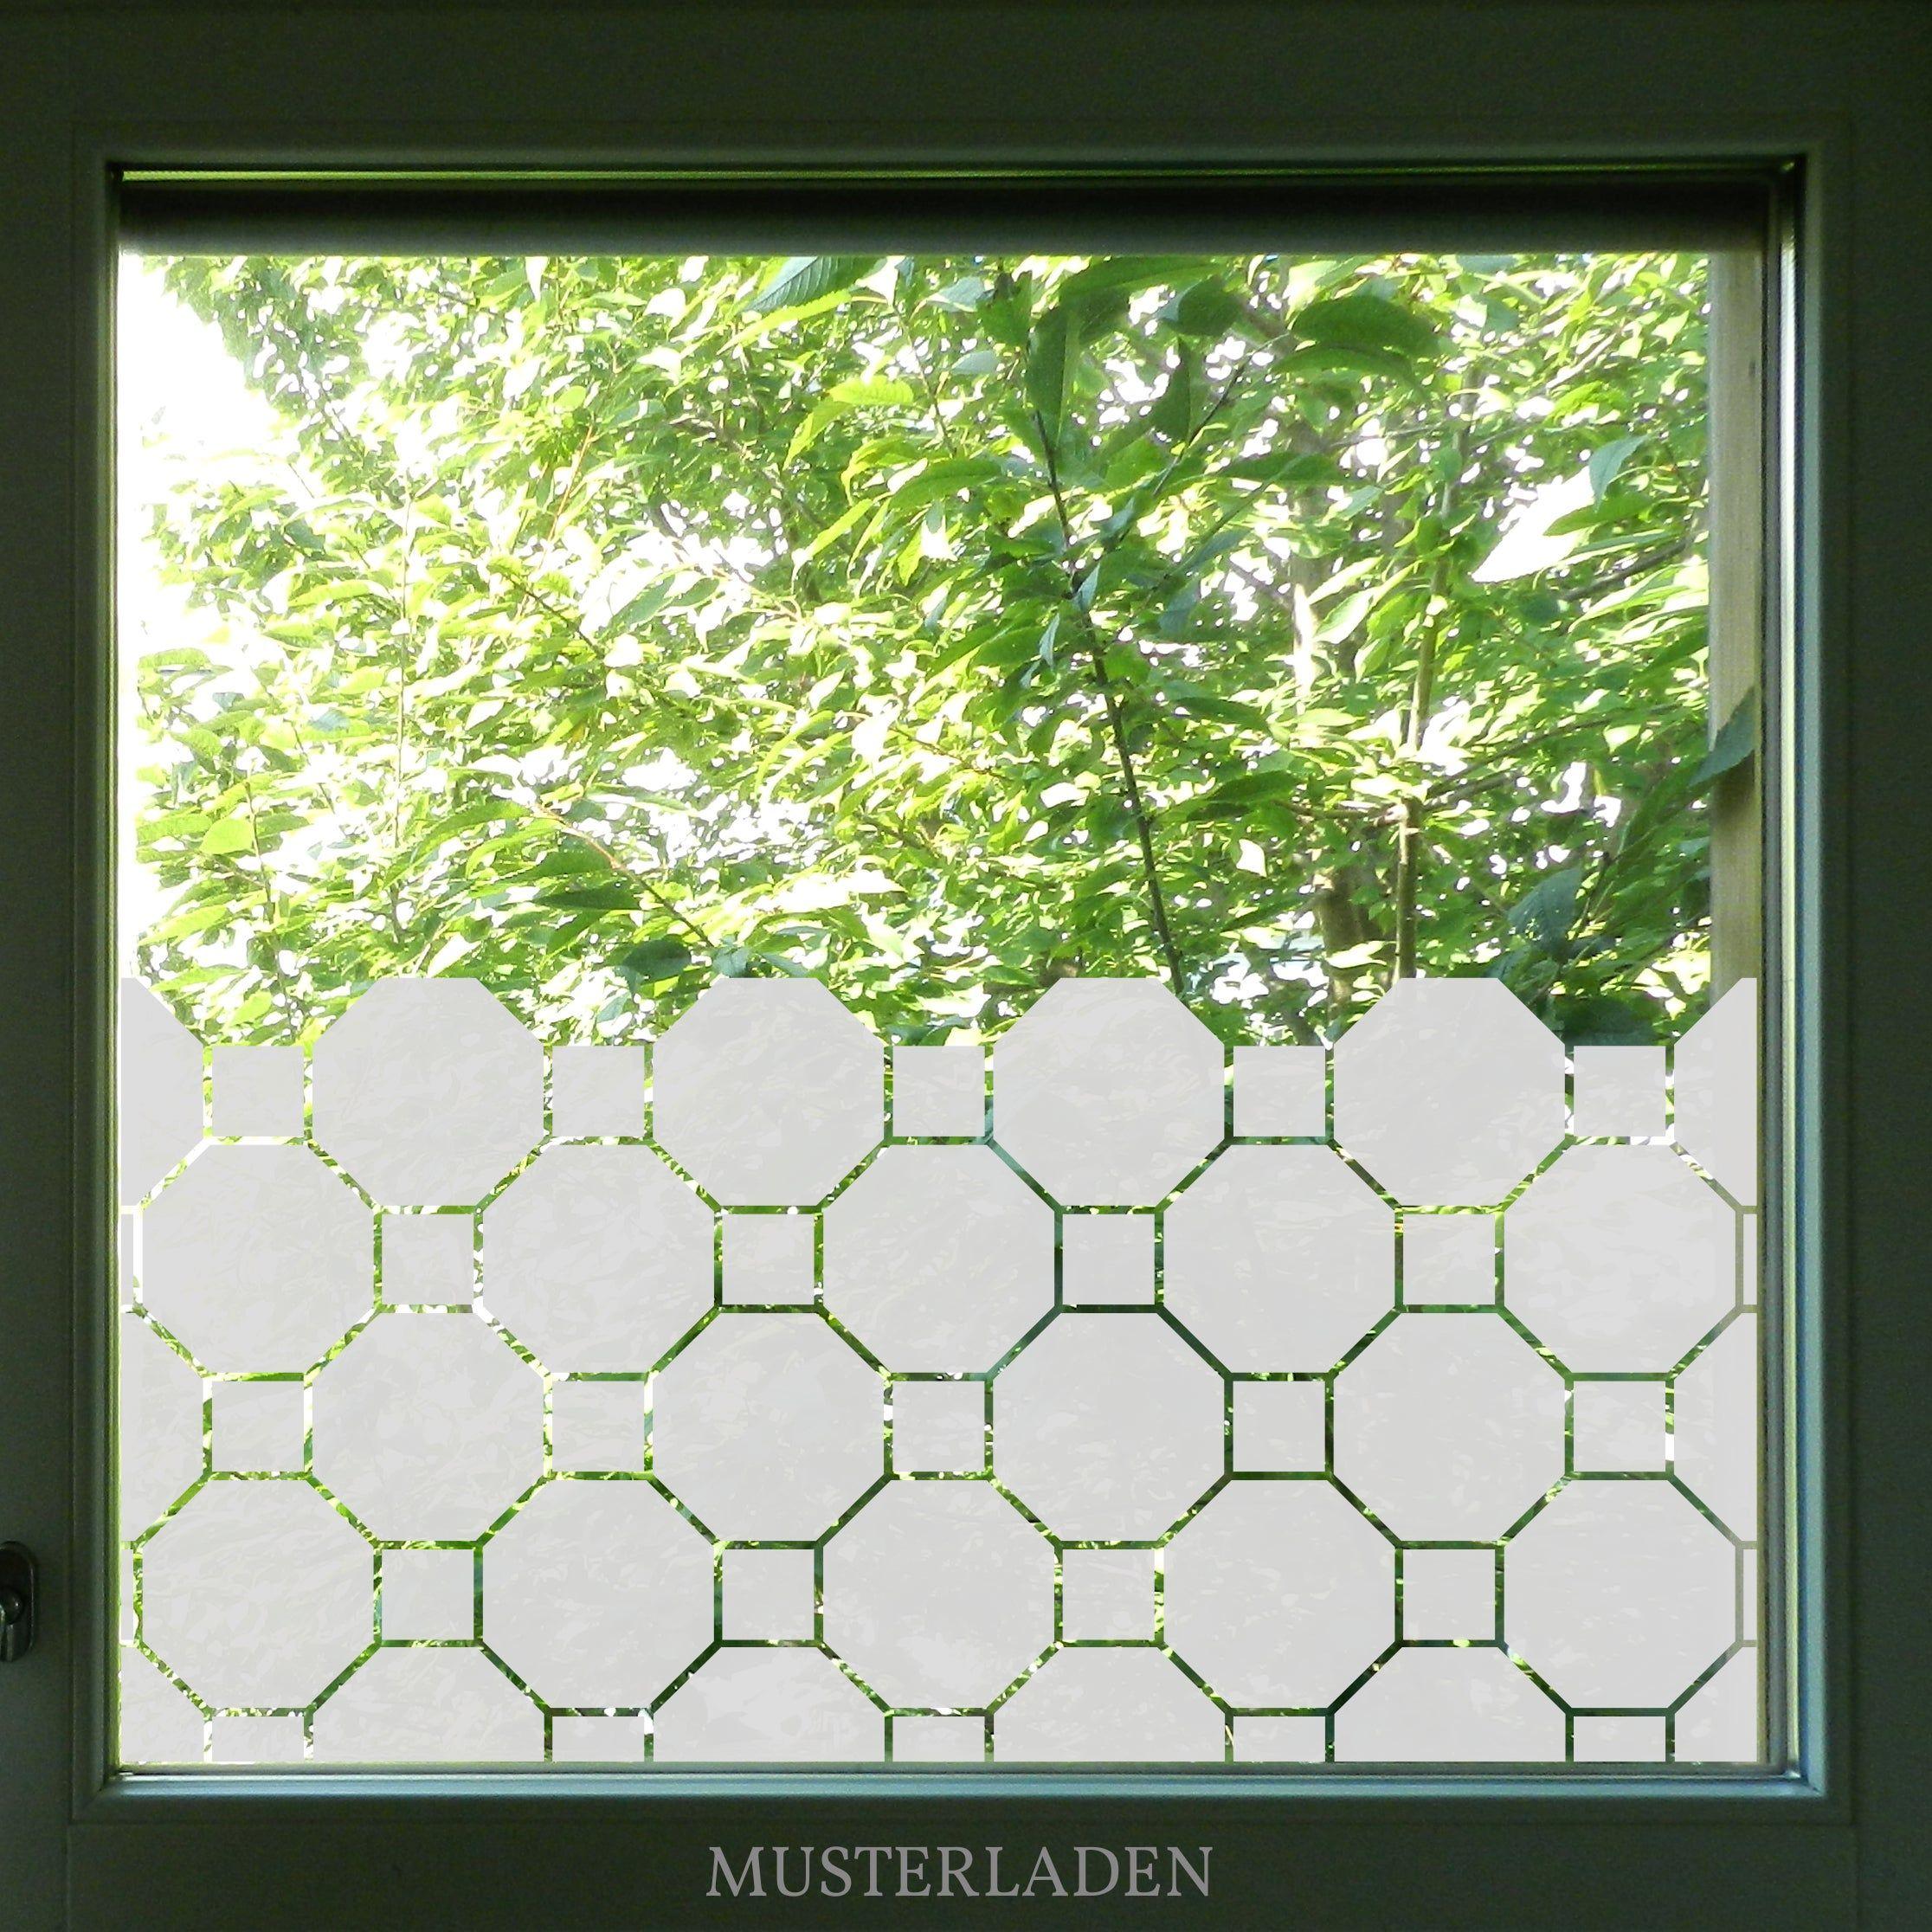 Fensterfolie Achteck Blickschutz Badezimmer Sichtschutz Folie Glastur Fensterfolie Fenster Dekor Fensterfolie Sichtschutz